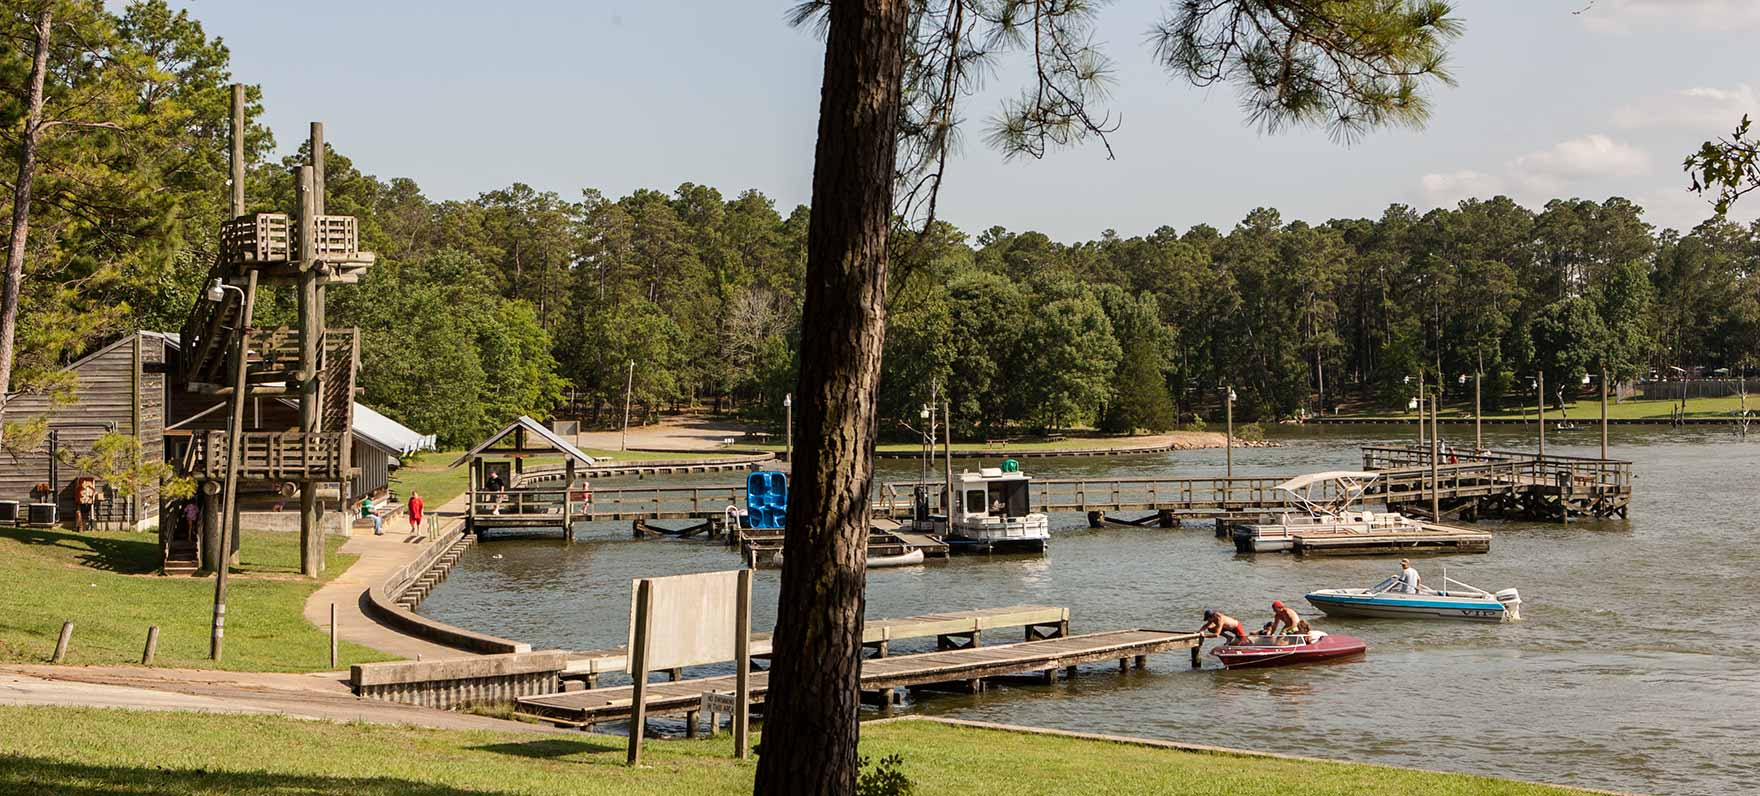 Lake Livingston State Park Texas Parks Amp Wildlife Department